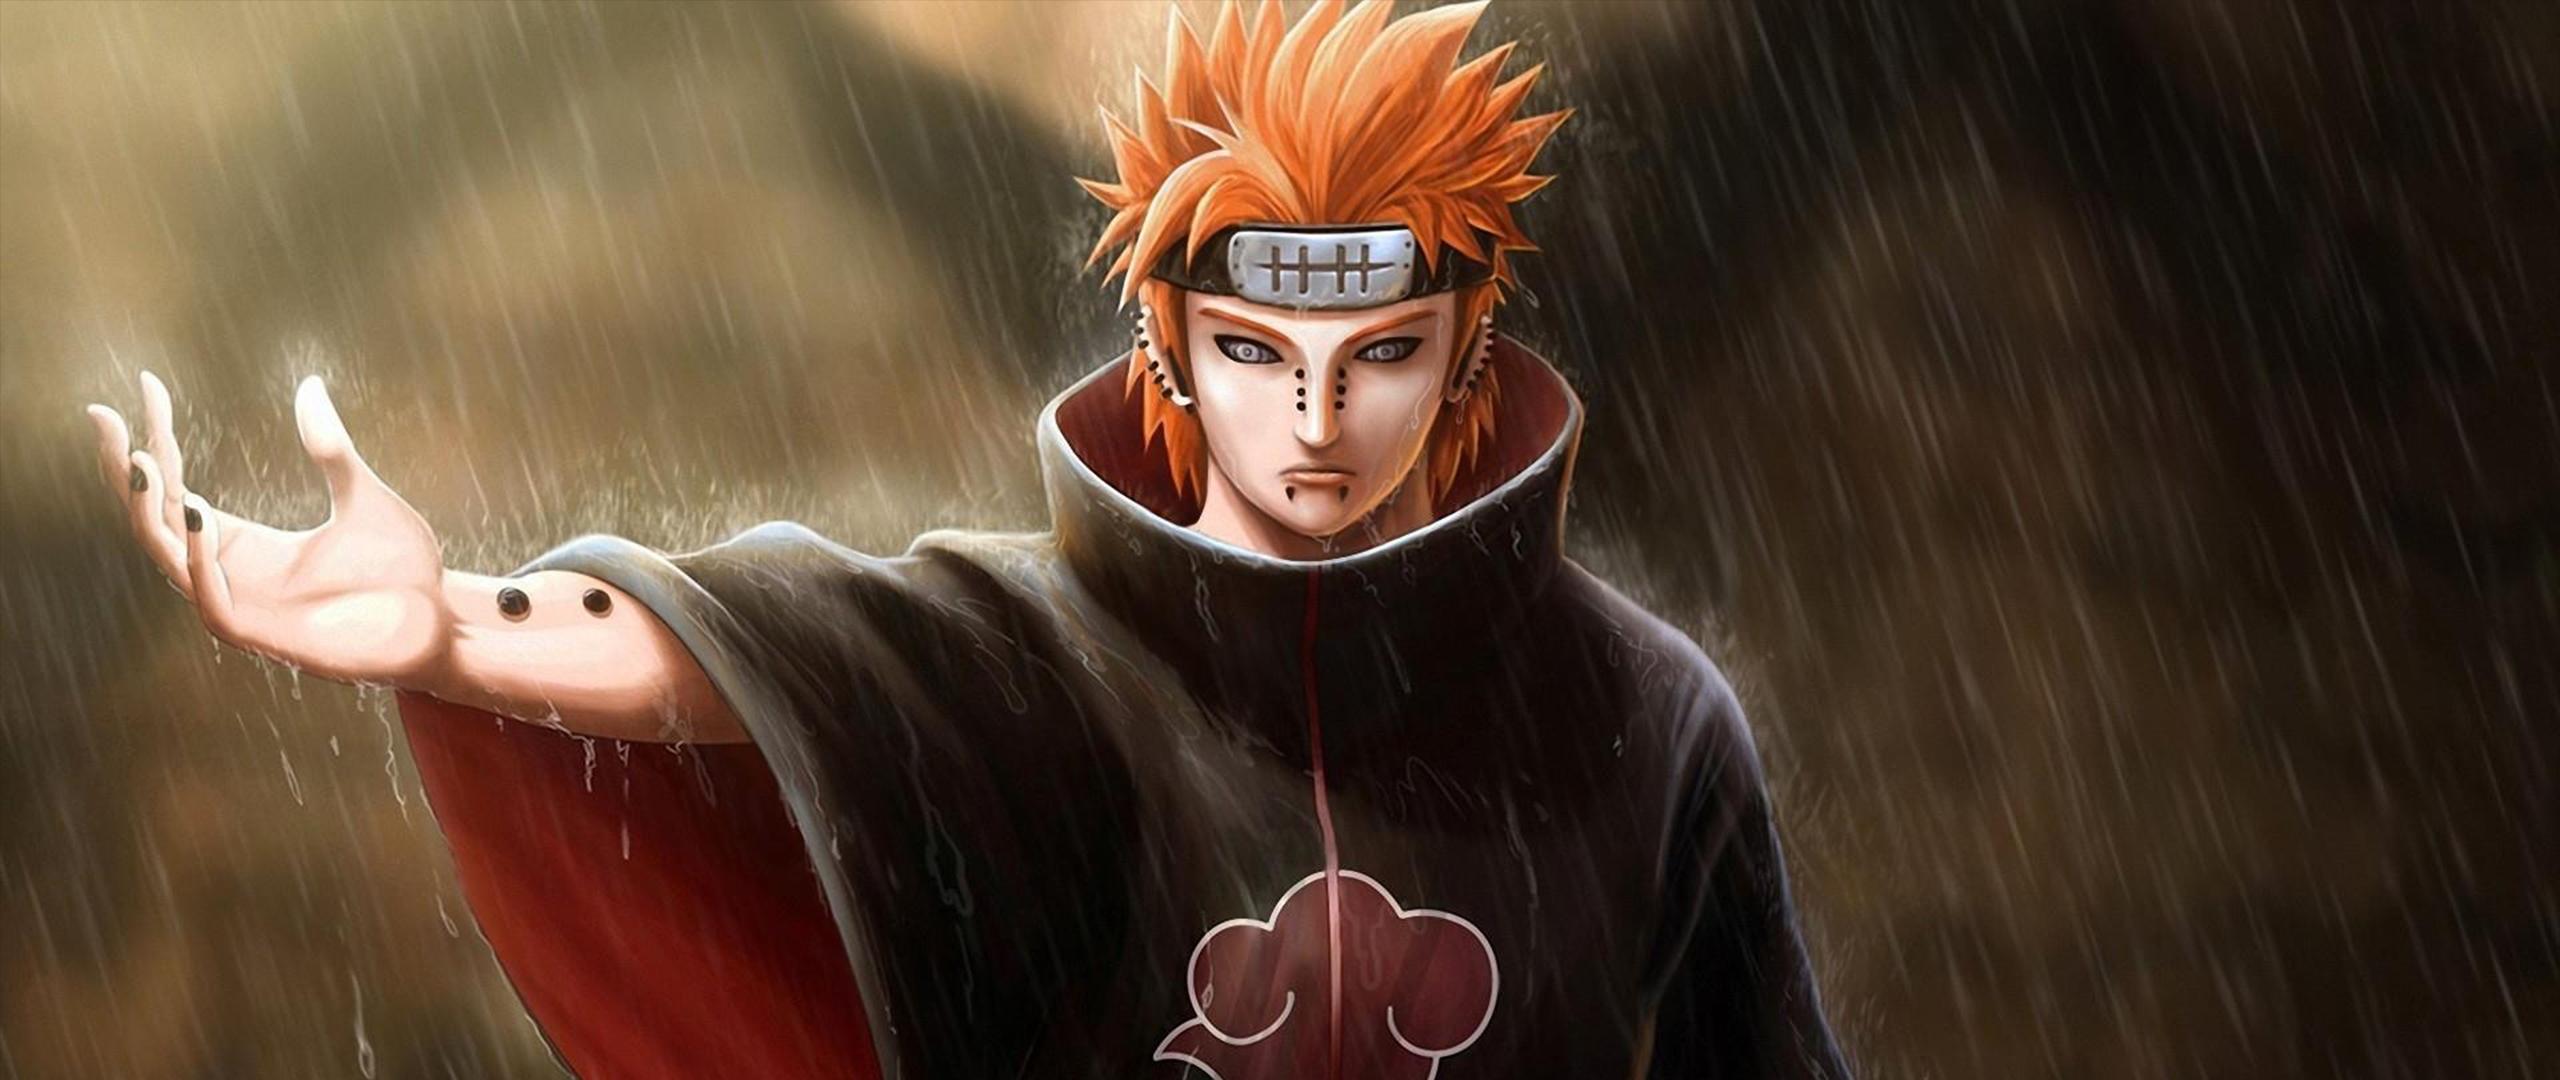 anime Naruto Shippuuden ultra wide screenshot computer wallpaper 23502